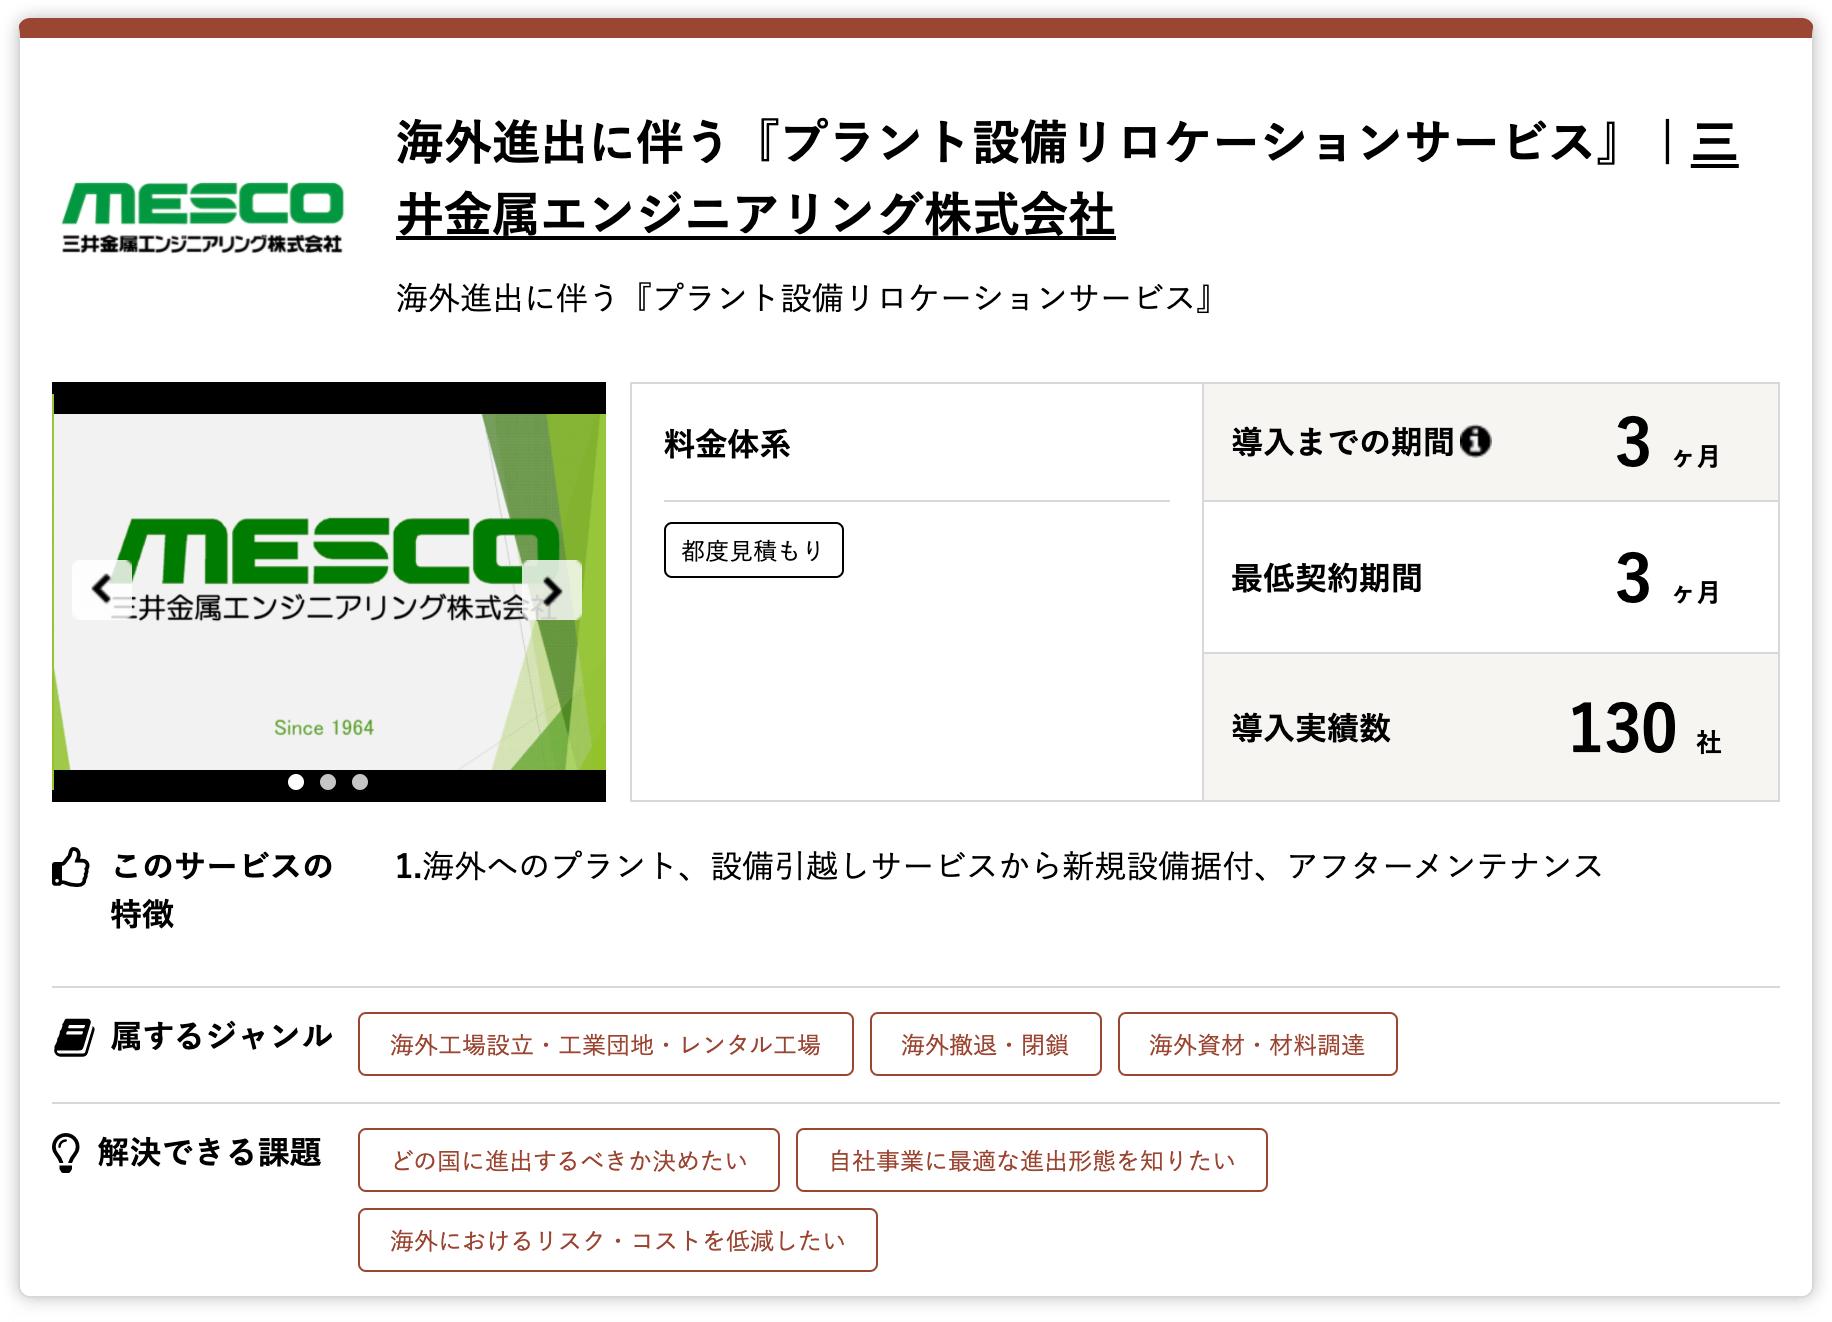 wpdl_三井金属エンジニアリング株式会社